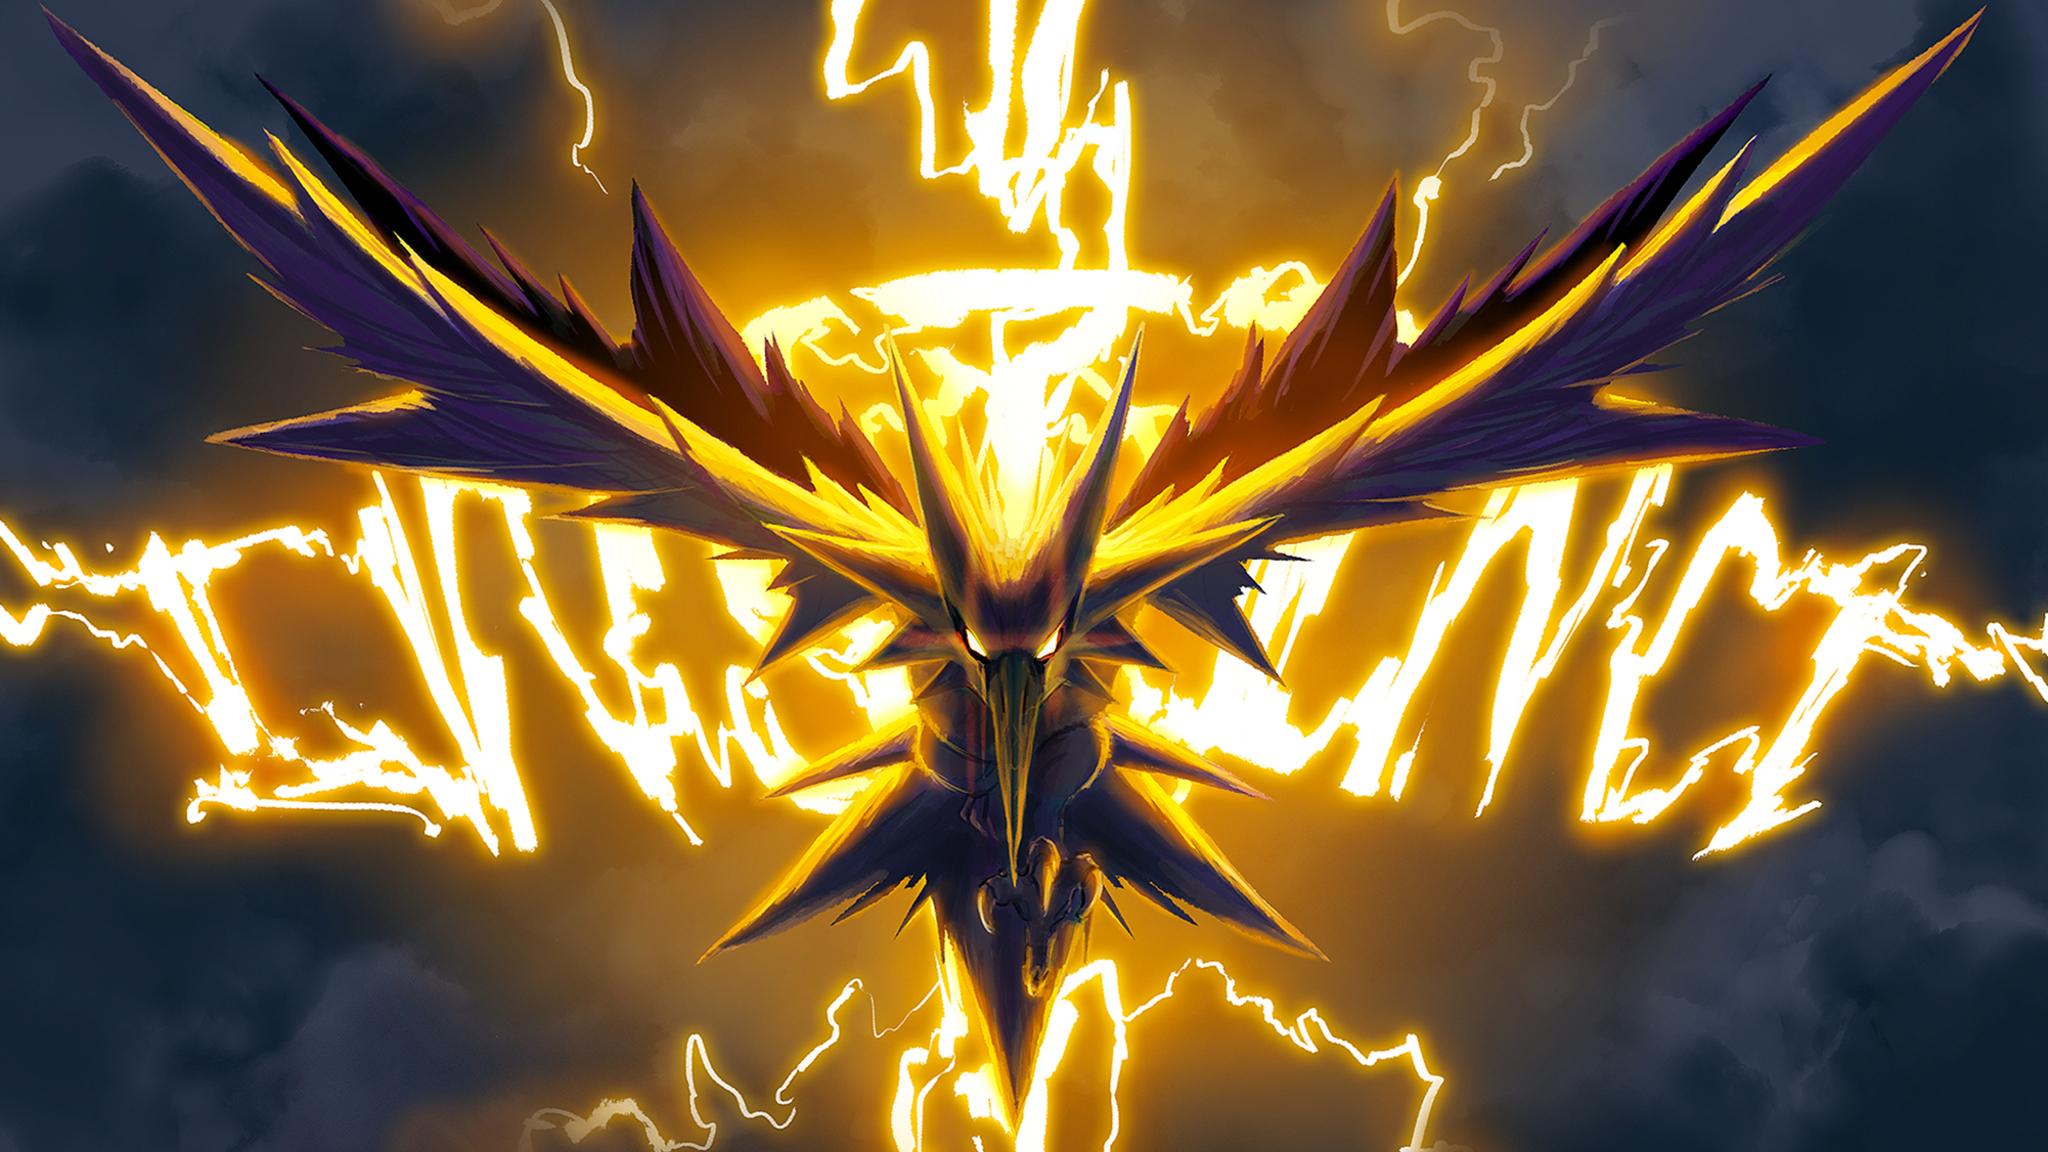 2048x1152 Zapdos Pokemon Go Art 2048x1152 Resolution Hd 4k